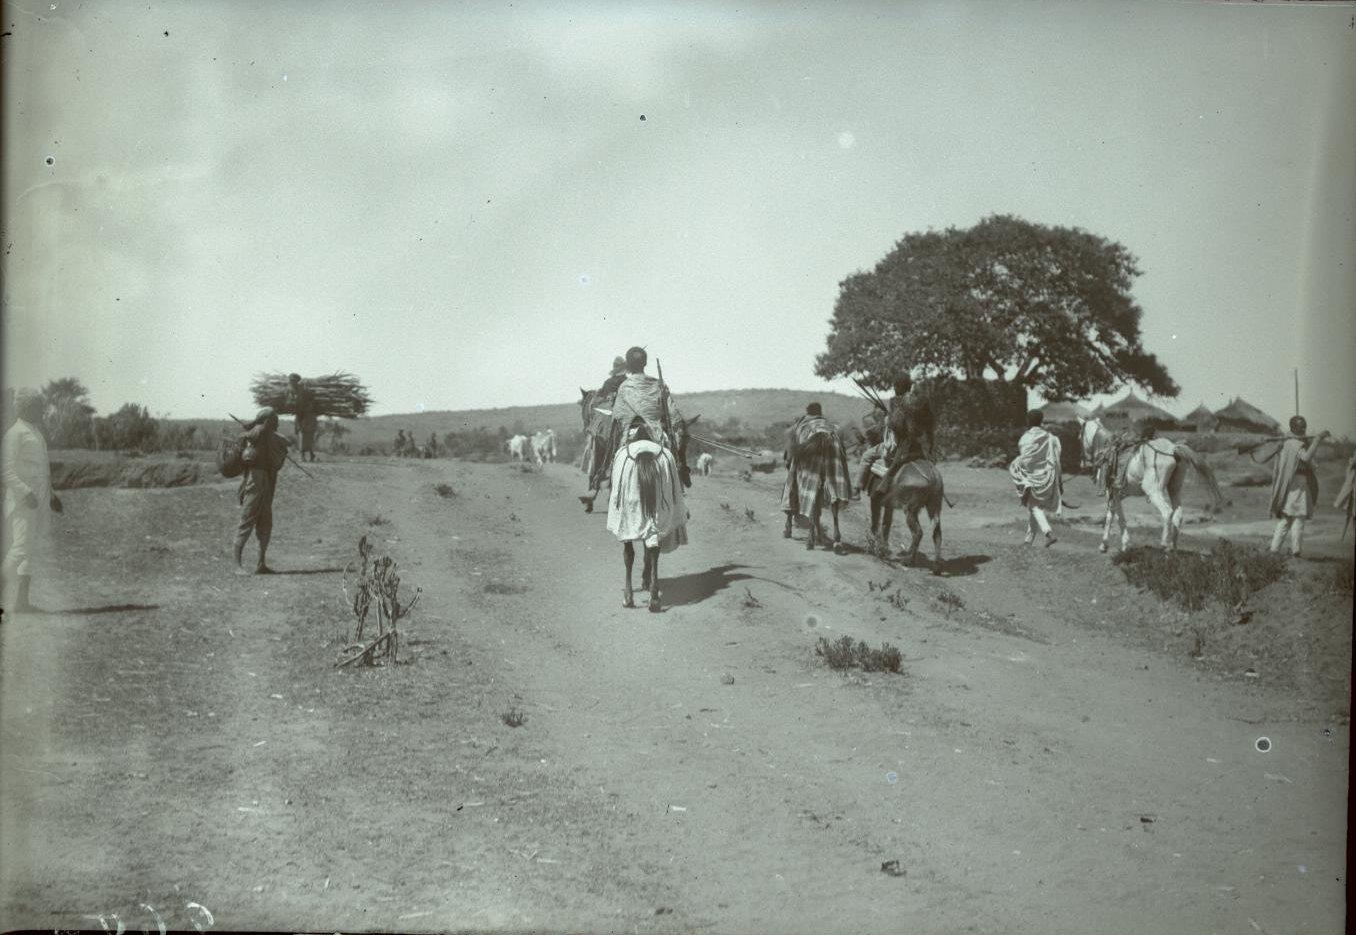 260. Абиссиния, провинция Харар, г. Харар. Эфиопский воин.